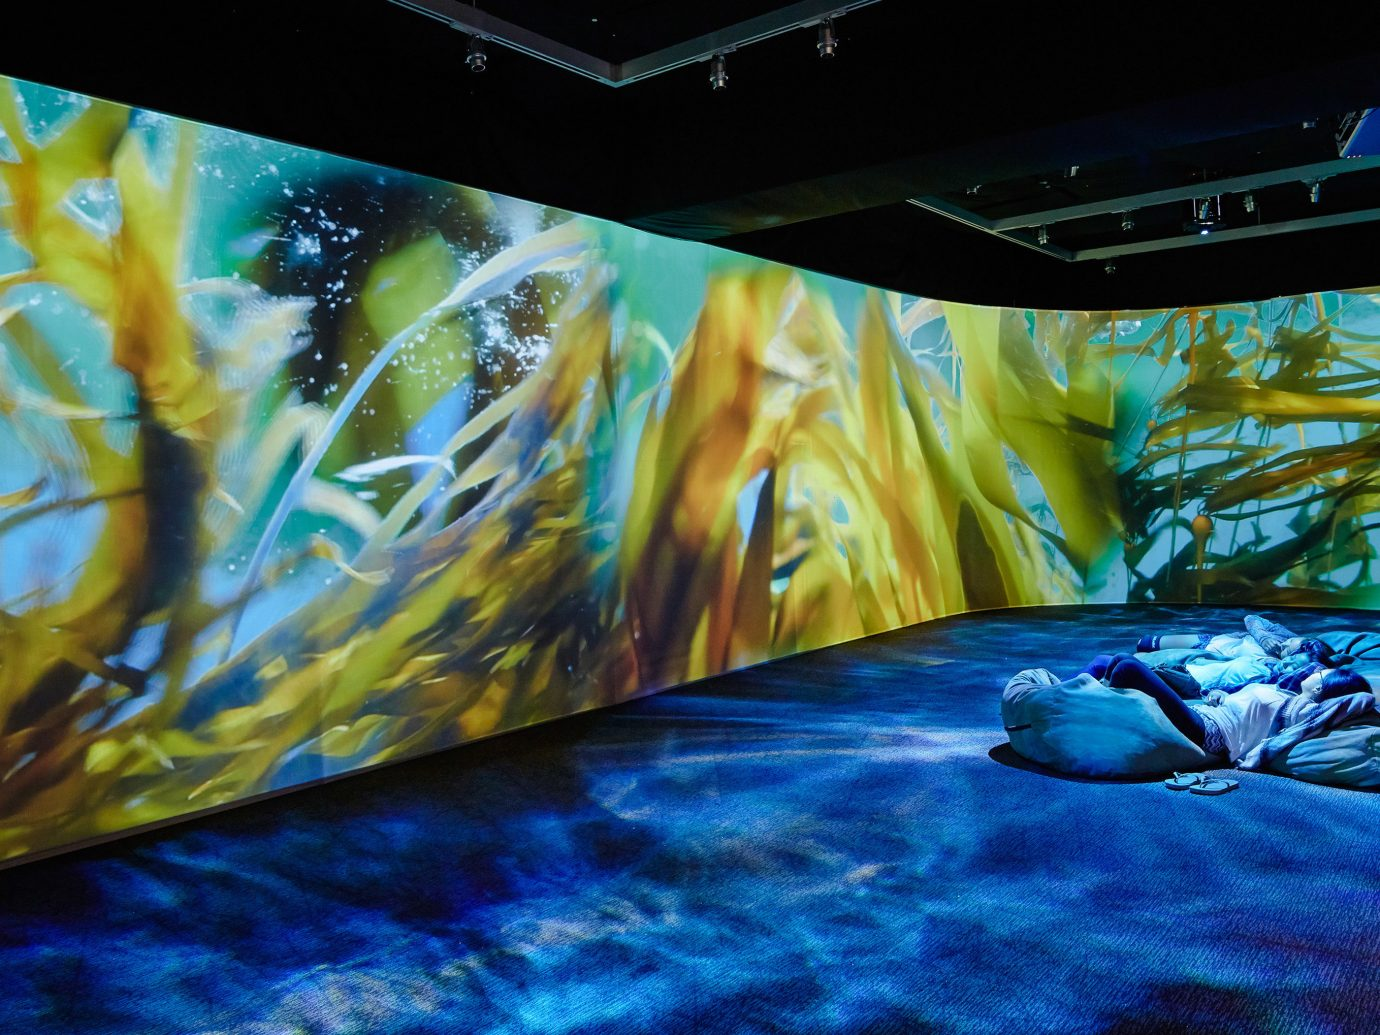 Trip Ideas marine biology aquarium freshwater aquarium underwater biology reef mural screenshot painting modern art display